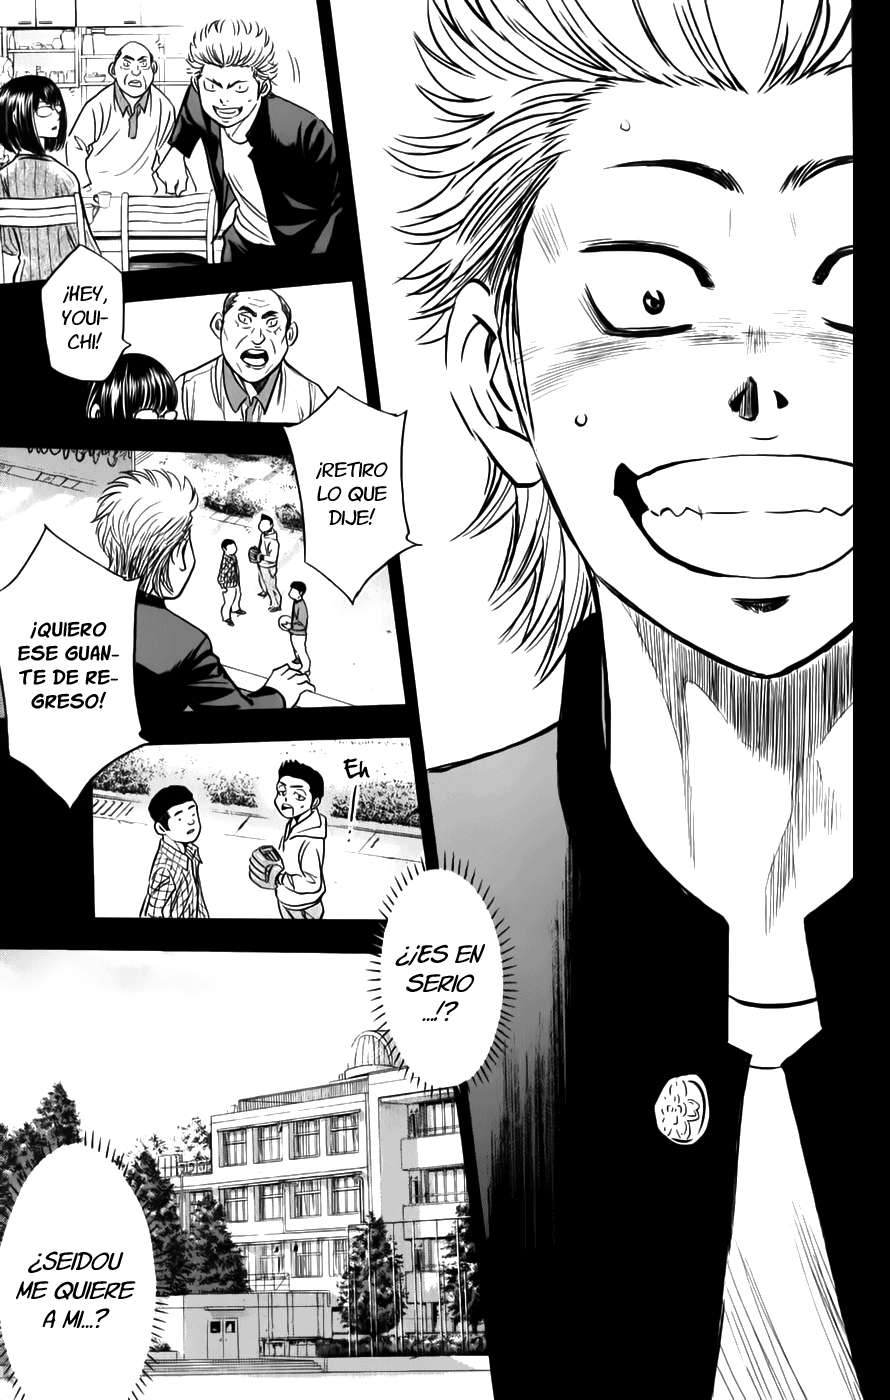 http://c5.ninemanga.com/es_manga/24/1752/395648/afab9e1401c7c4b559e2723add38e05a.jpg Page 10